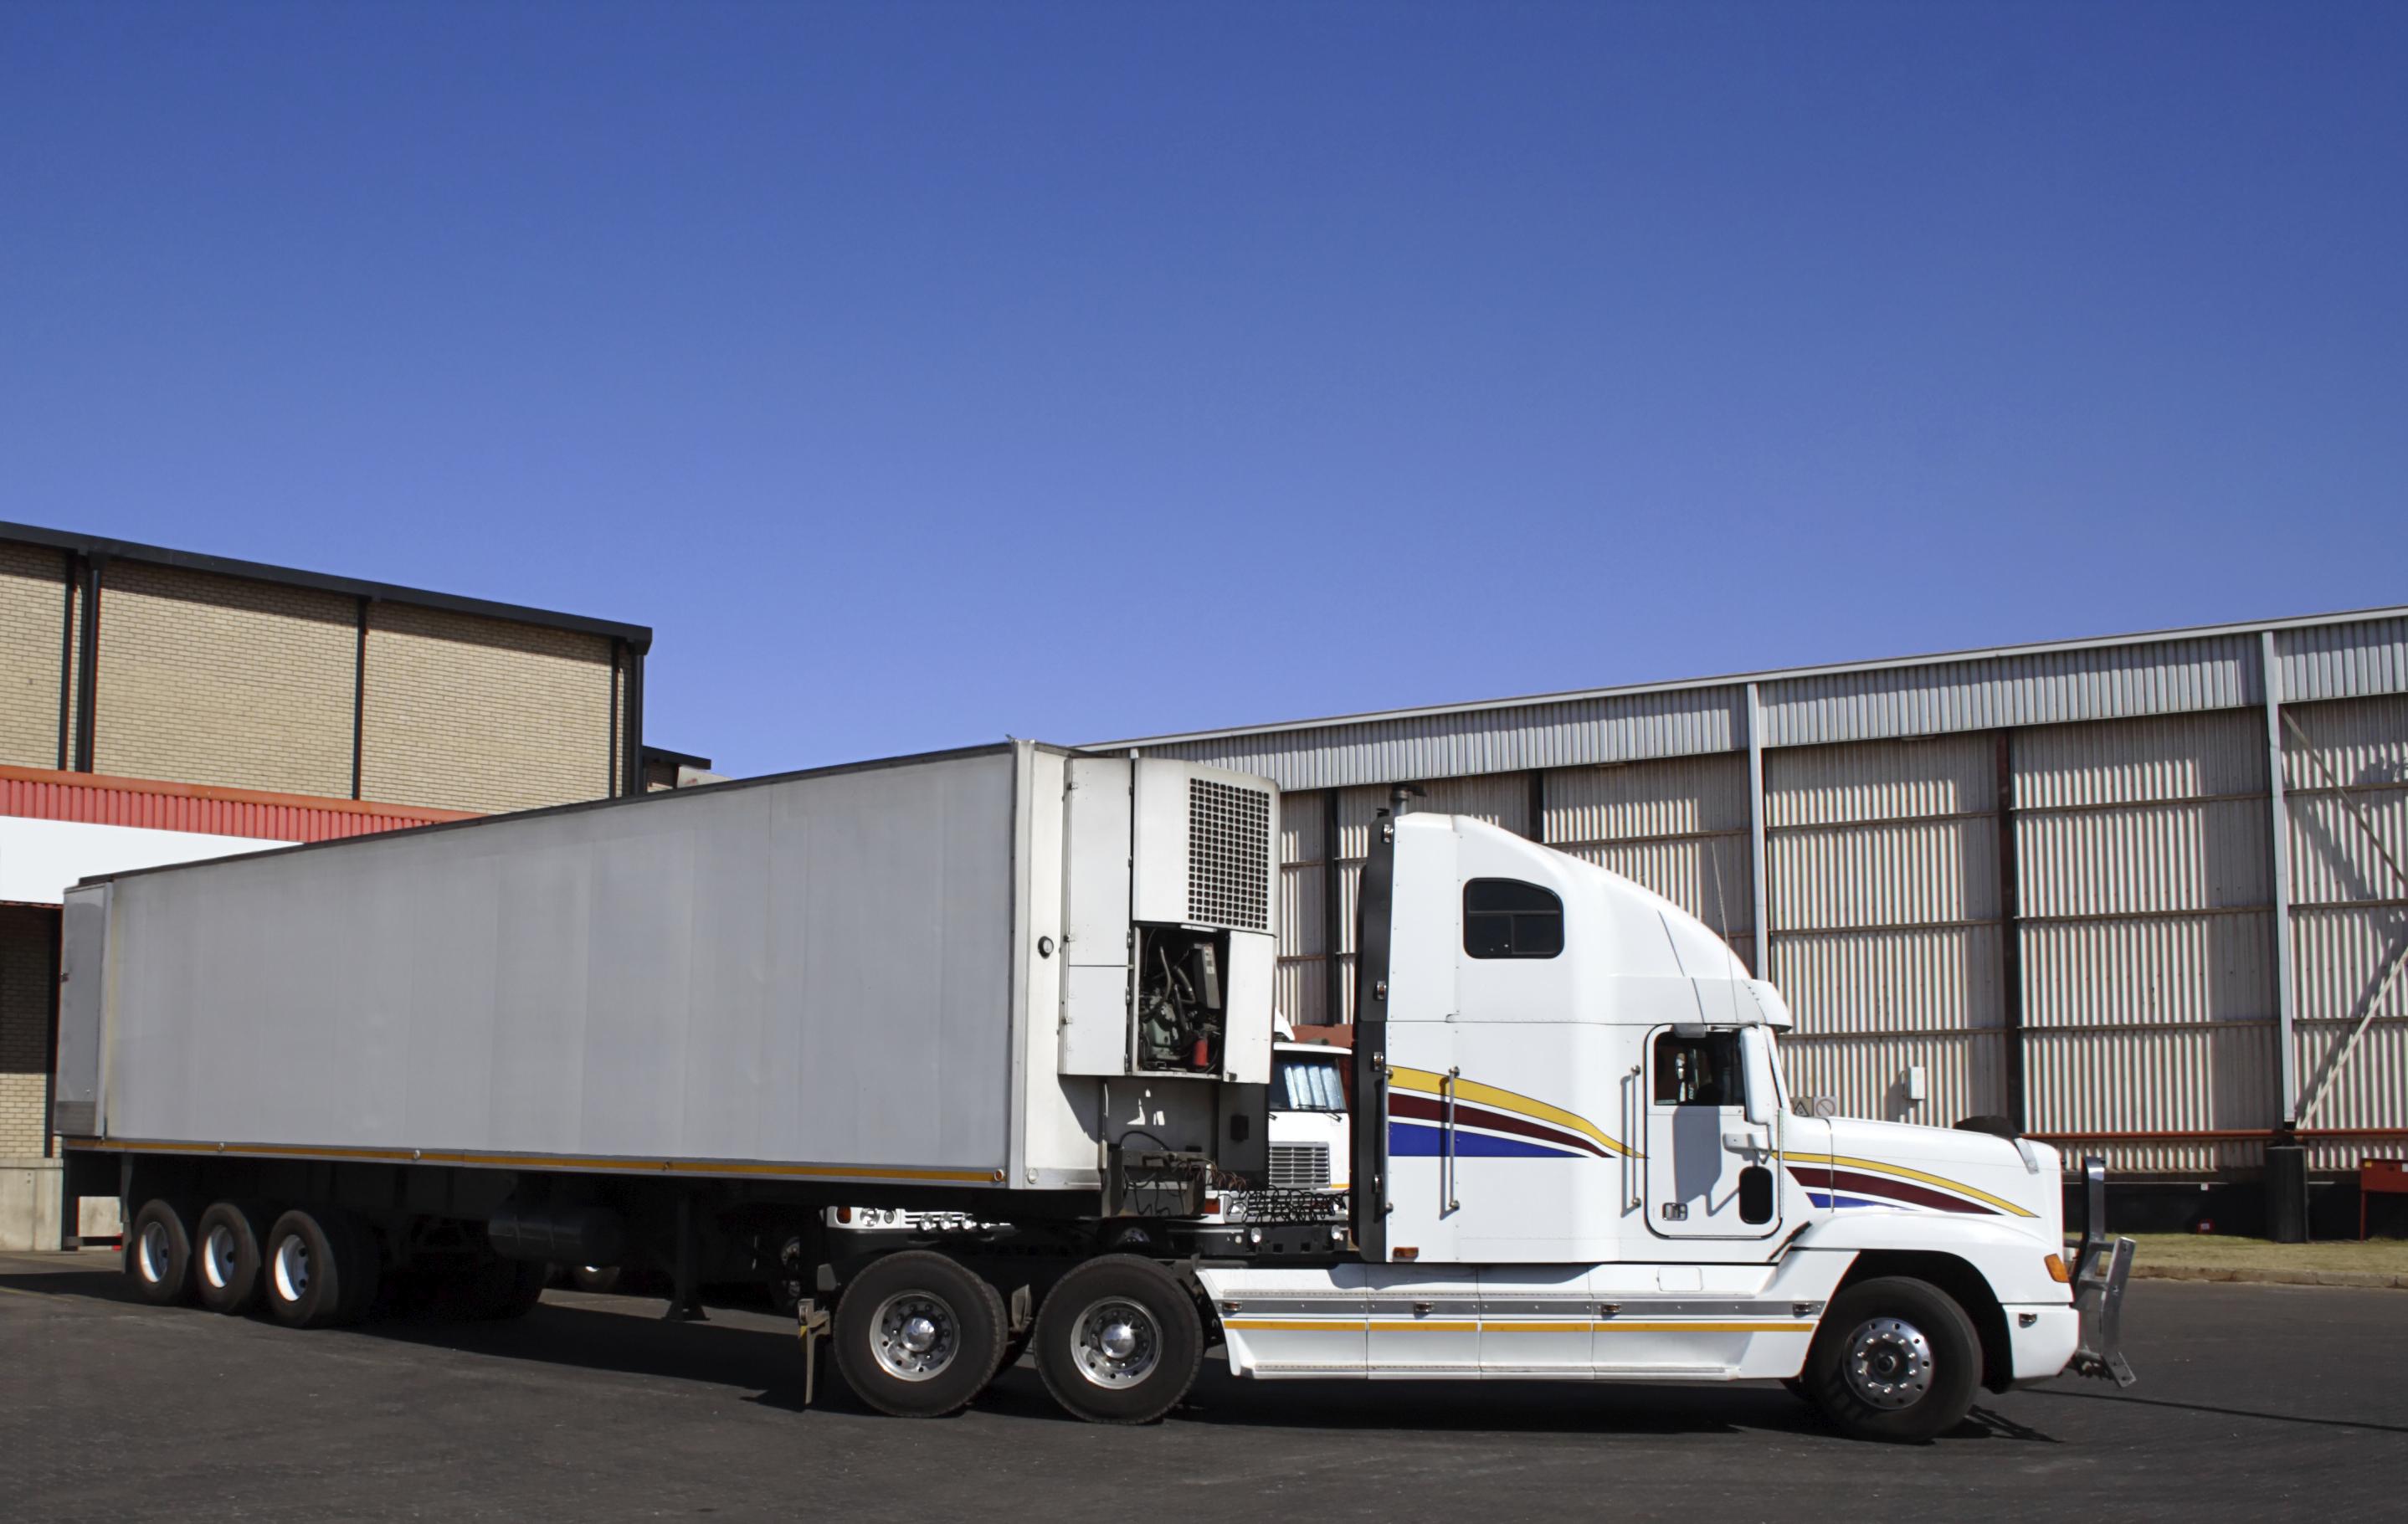 Trucks pictures of semi